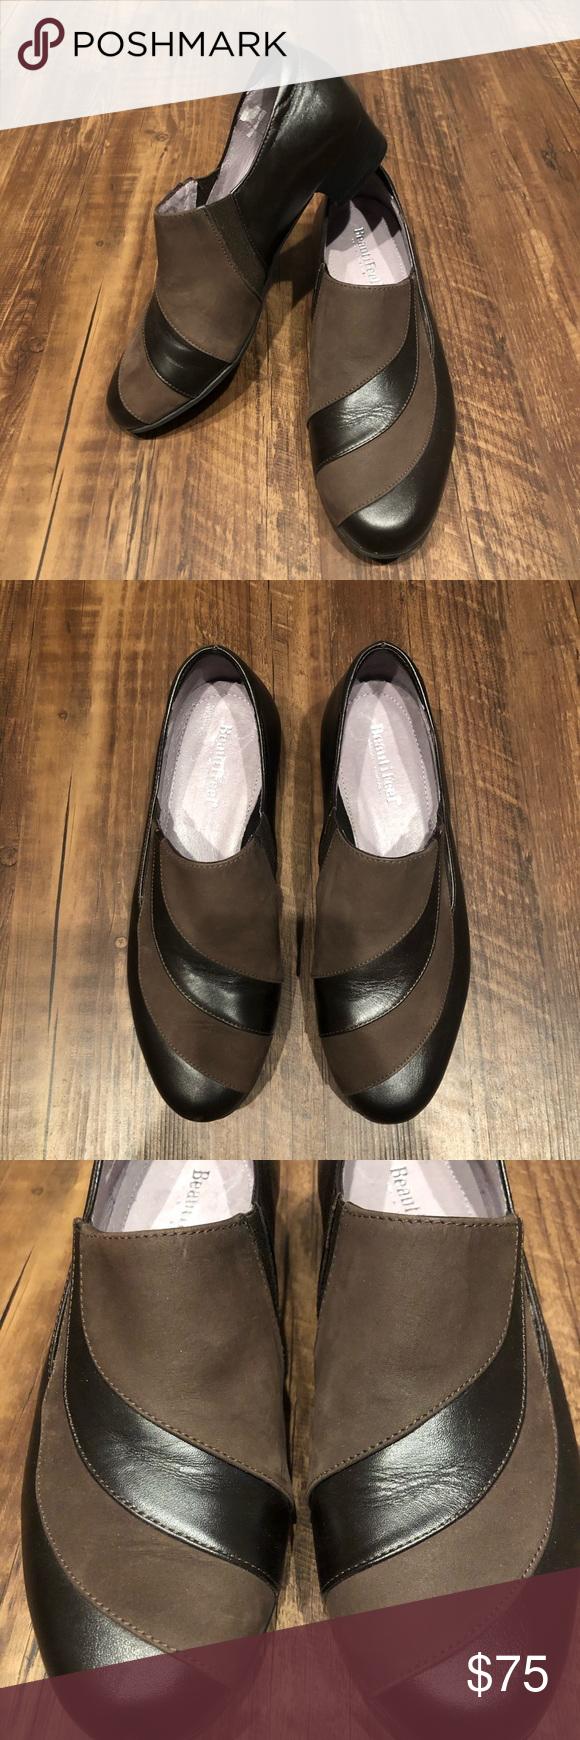 BeautiFeel Leather Dress Shoes BeautiFeel Leather